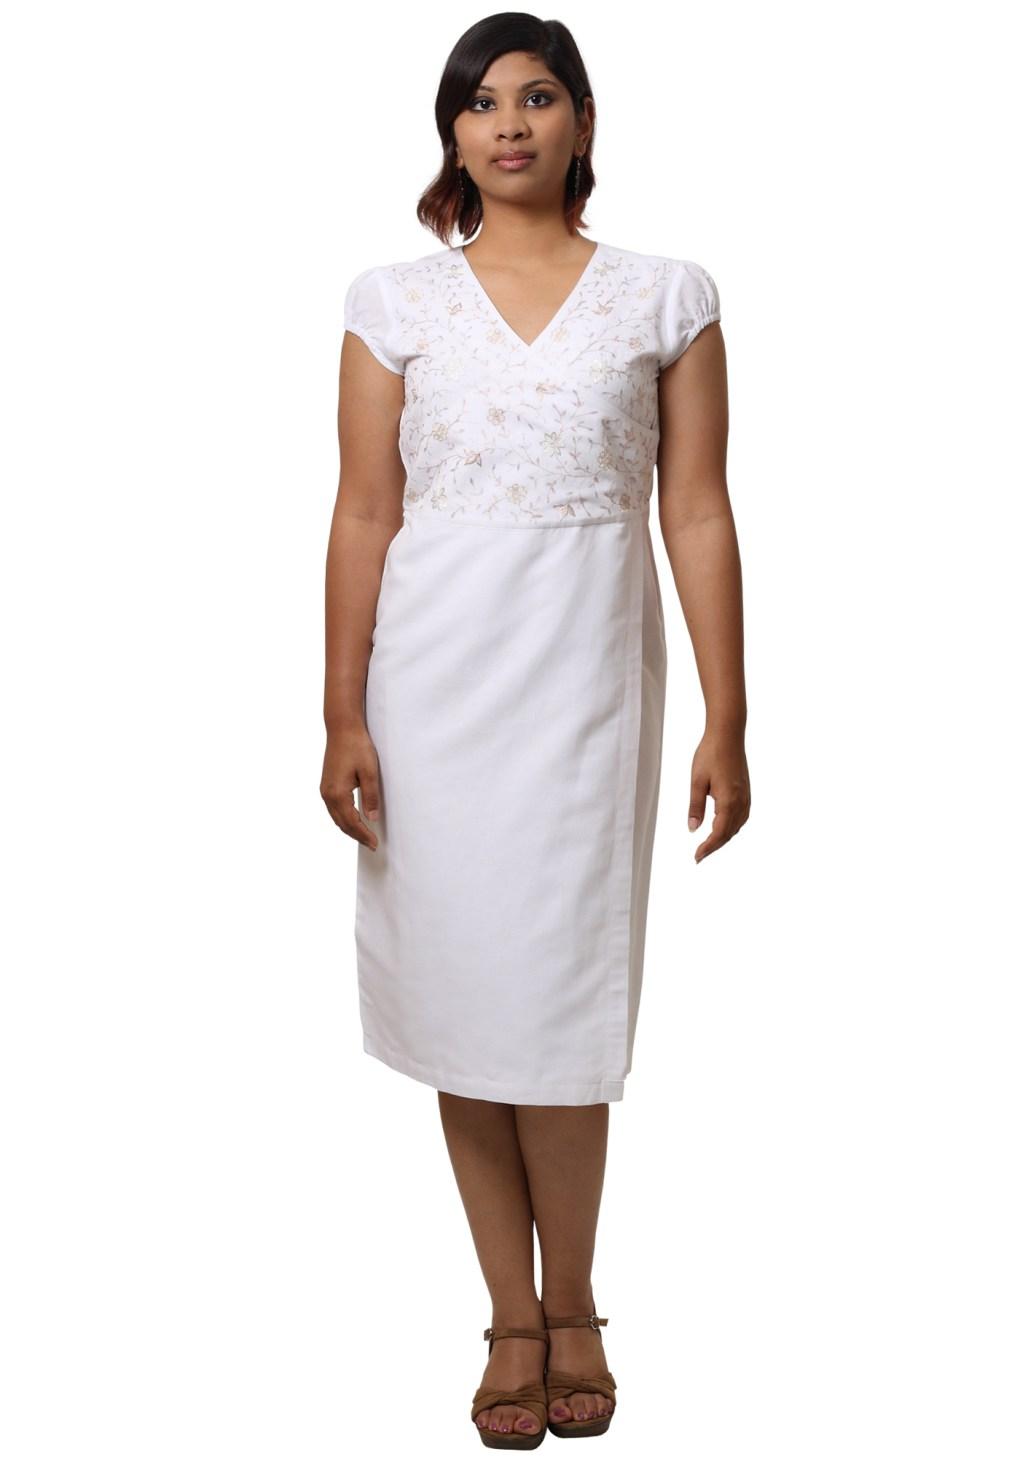 MINC Asymmetric Embroidered White Linen Dress